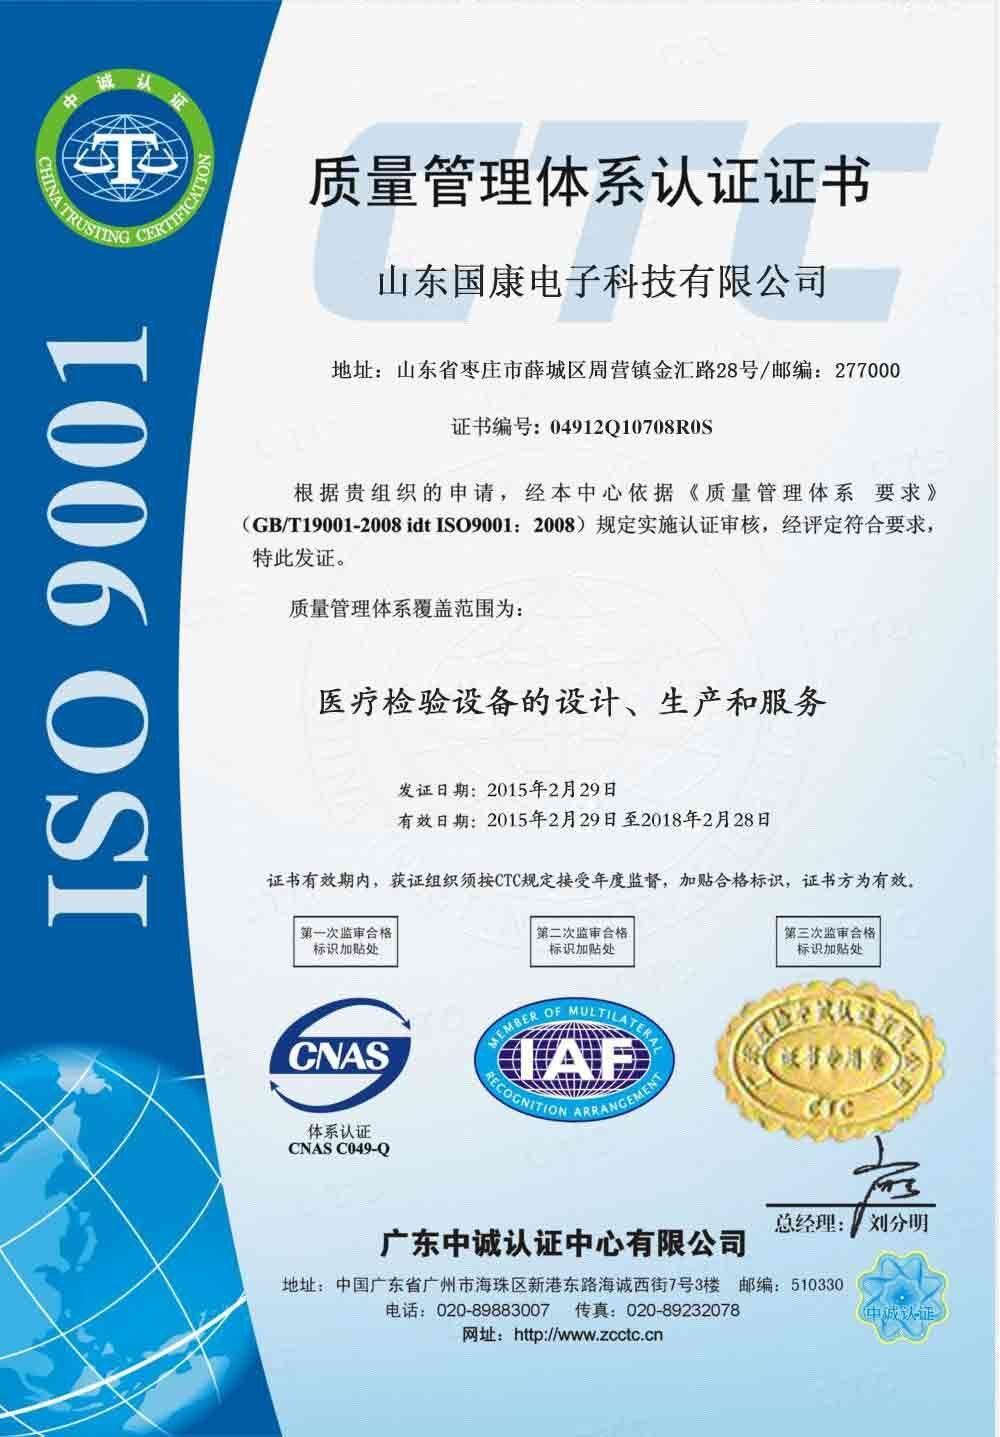 <b>超声骨密度仪ISO质量管理体系认证</b>